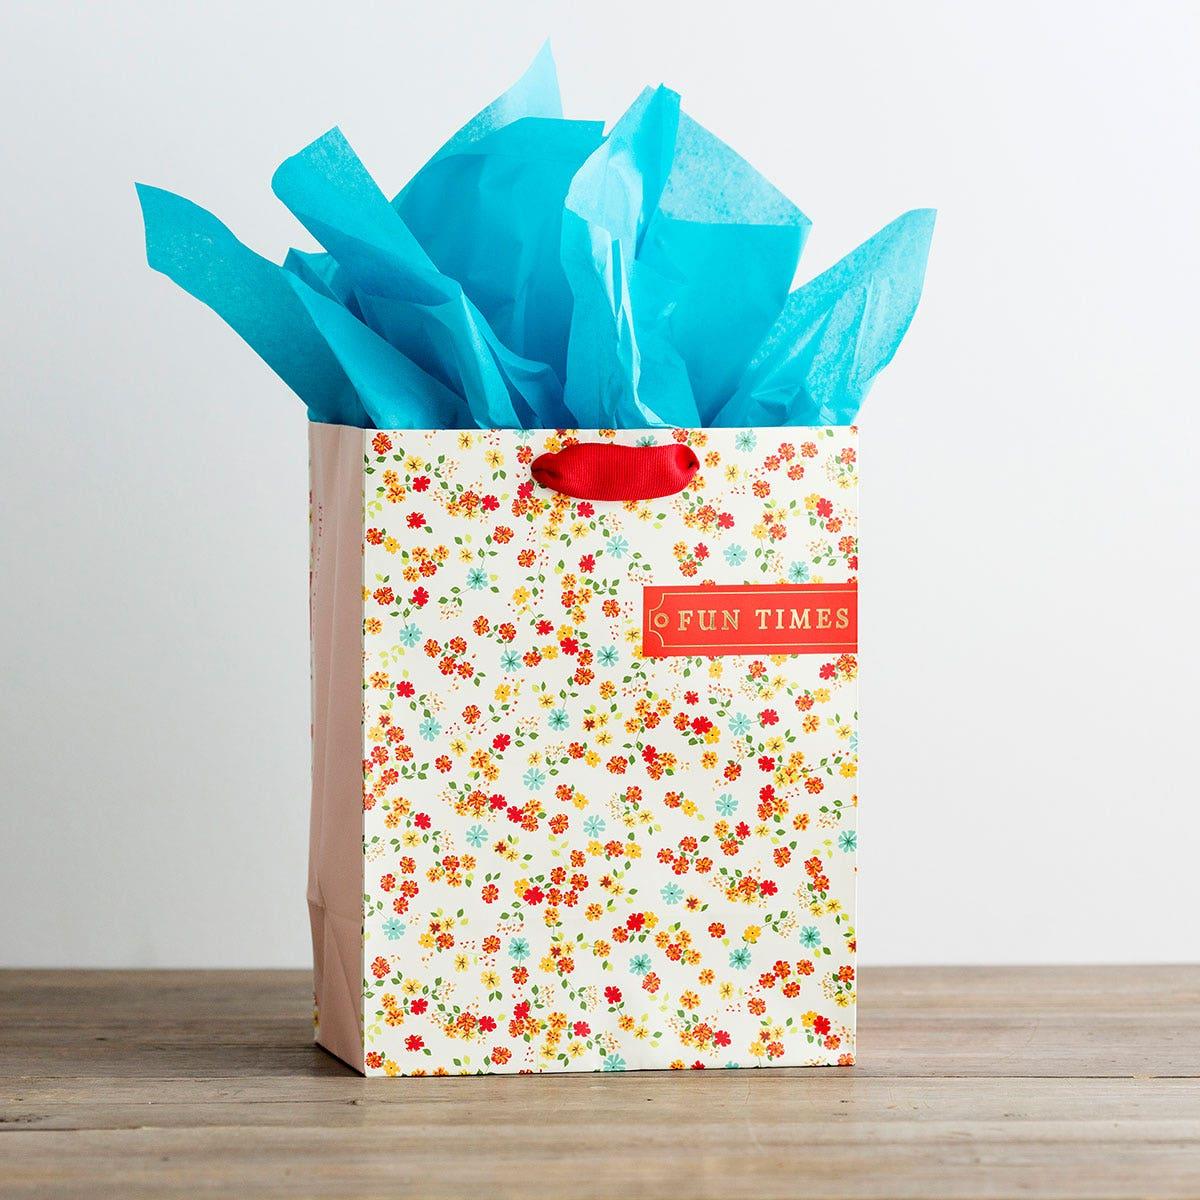 Fun Times - Medium Gift Bag with Tissue